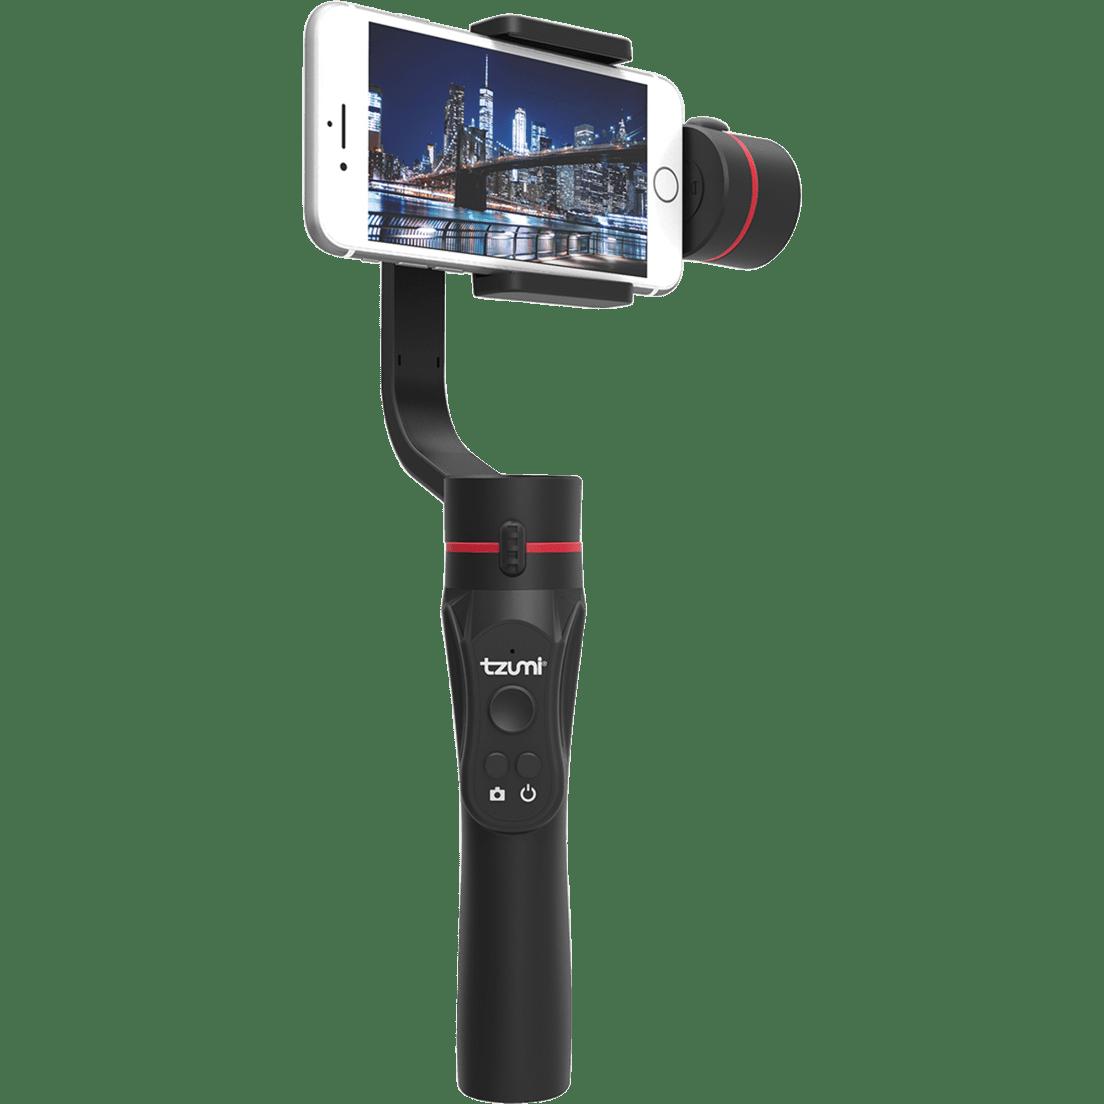 Tzumi SteadyGo Smartphone Stabilizing Gimbal